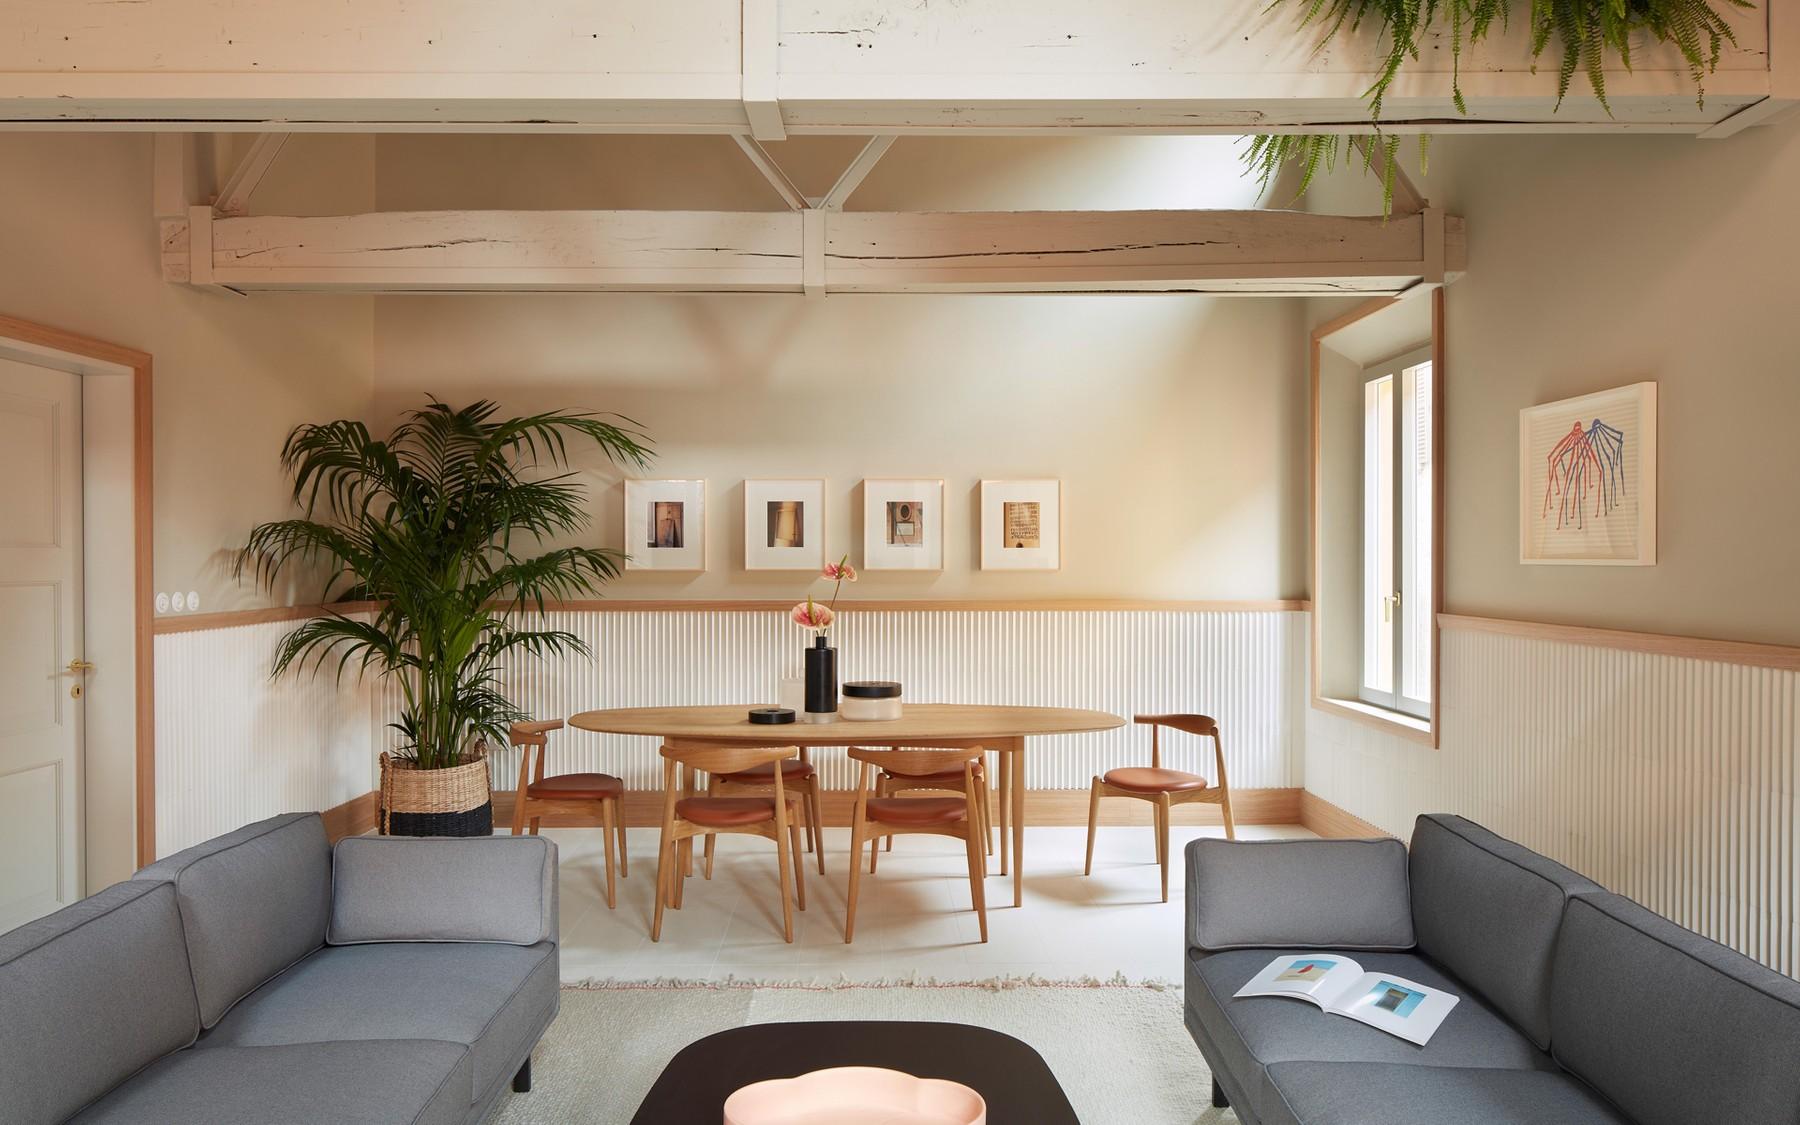 Casa Mutina, Modena, Italy (designed by OEO Studio and Mutina Product Division)